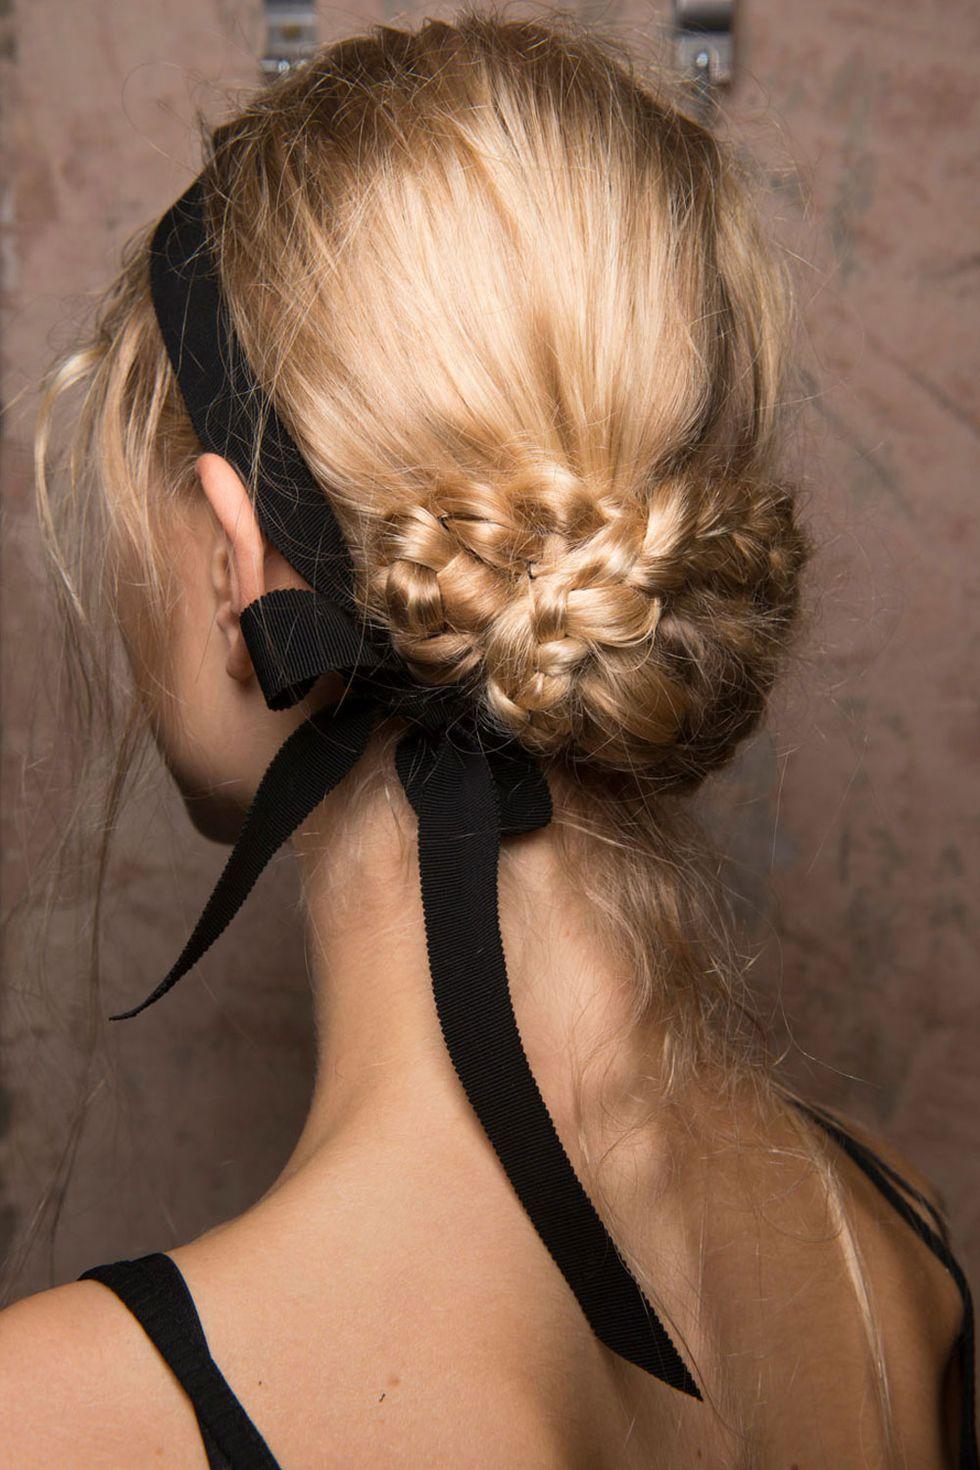 wedding-guest-hair-chignon-bun-style-beauty-ribbon-headband-braided-messy.jpg